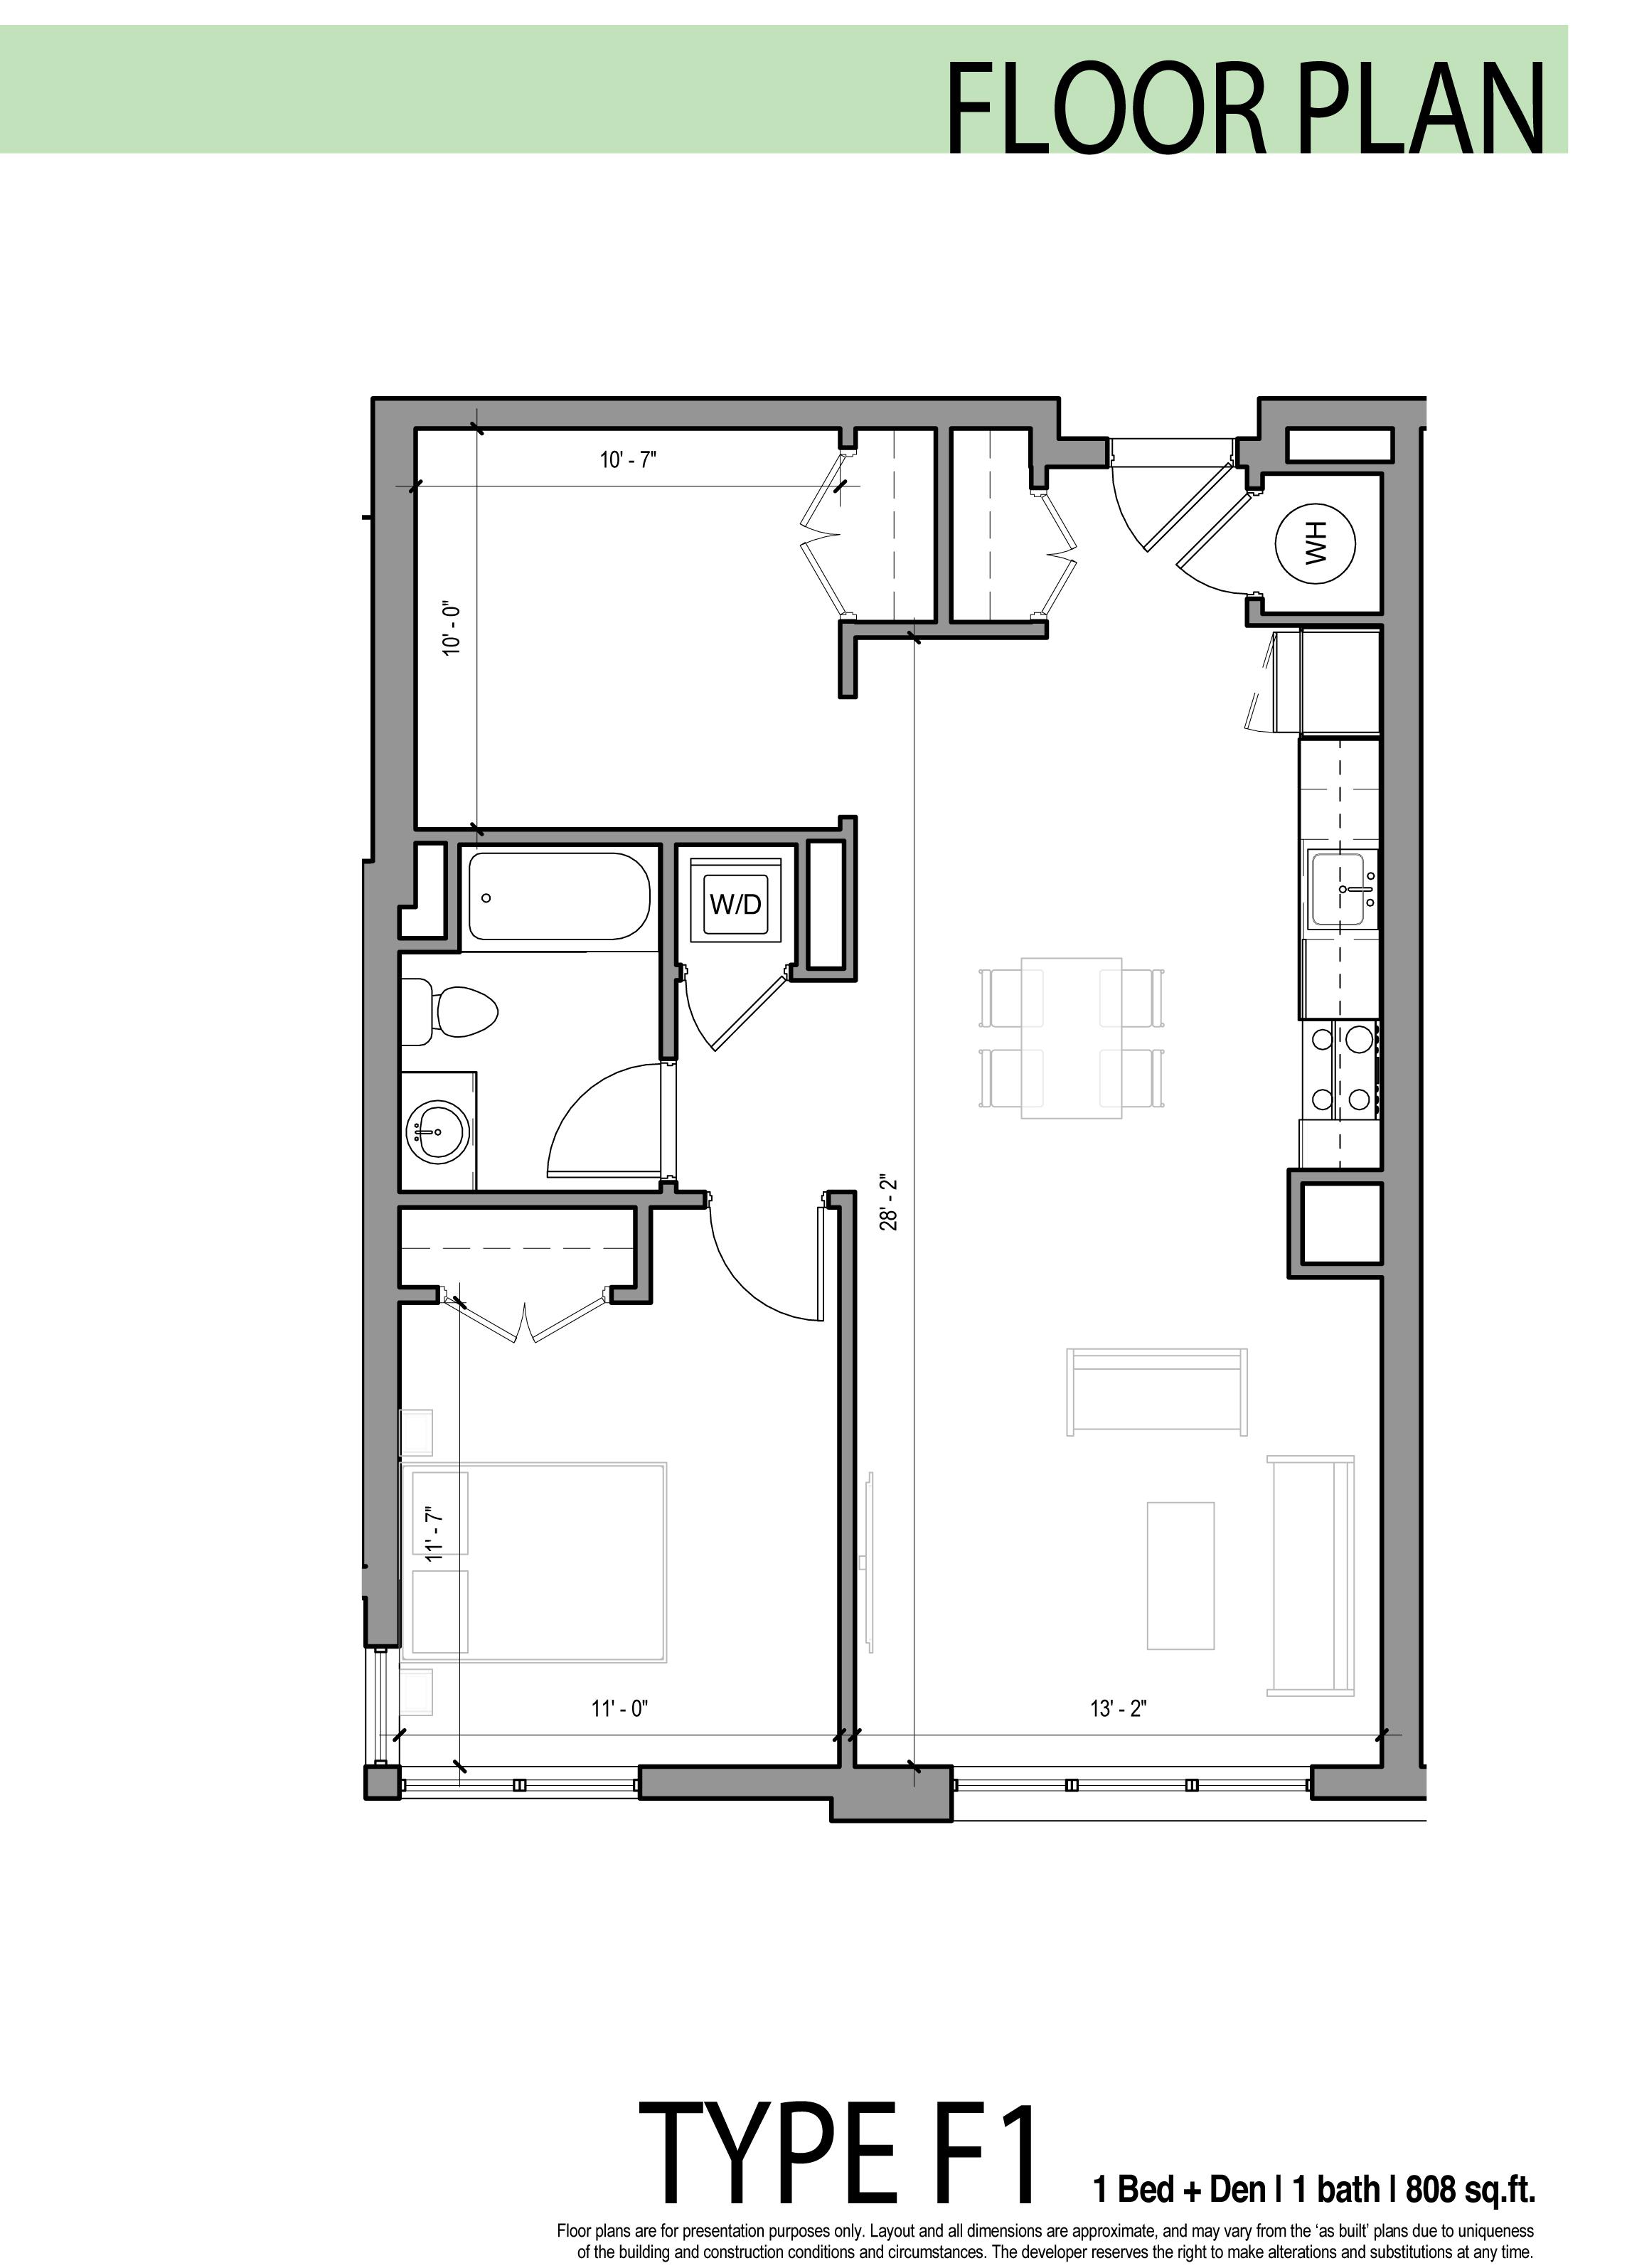 Captivating Apartments Buildings Plans Edge Plan E Edge Plan Edge Allston Plans Plans Apartment At Lenox West apartment Floor Plans For Apartments